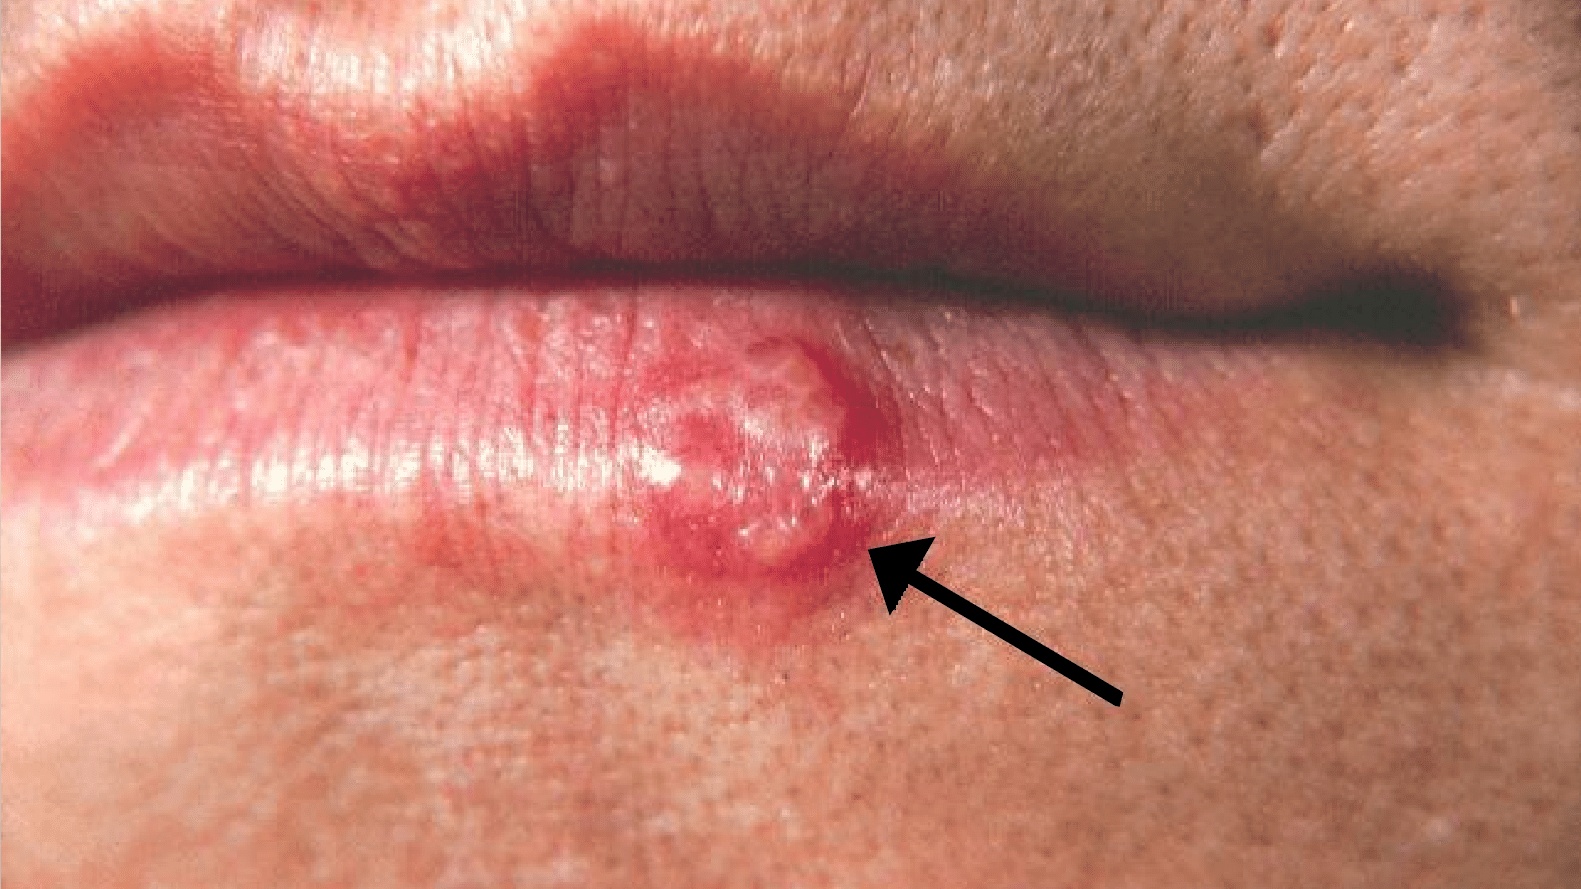 Herpes Simplex Virus (HSV) and HIV